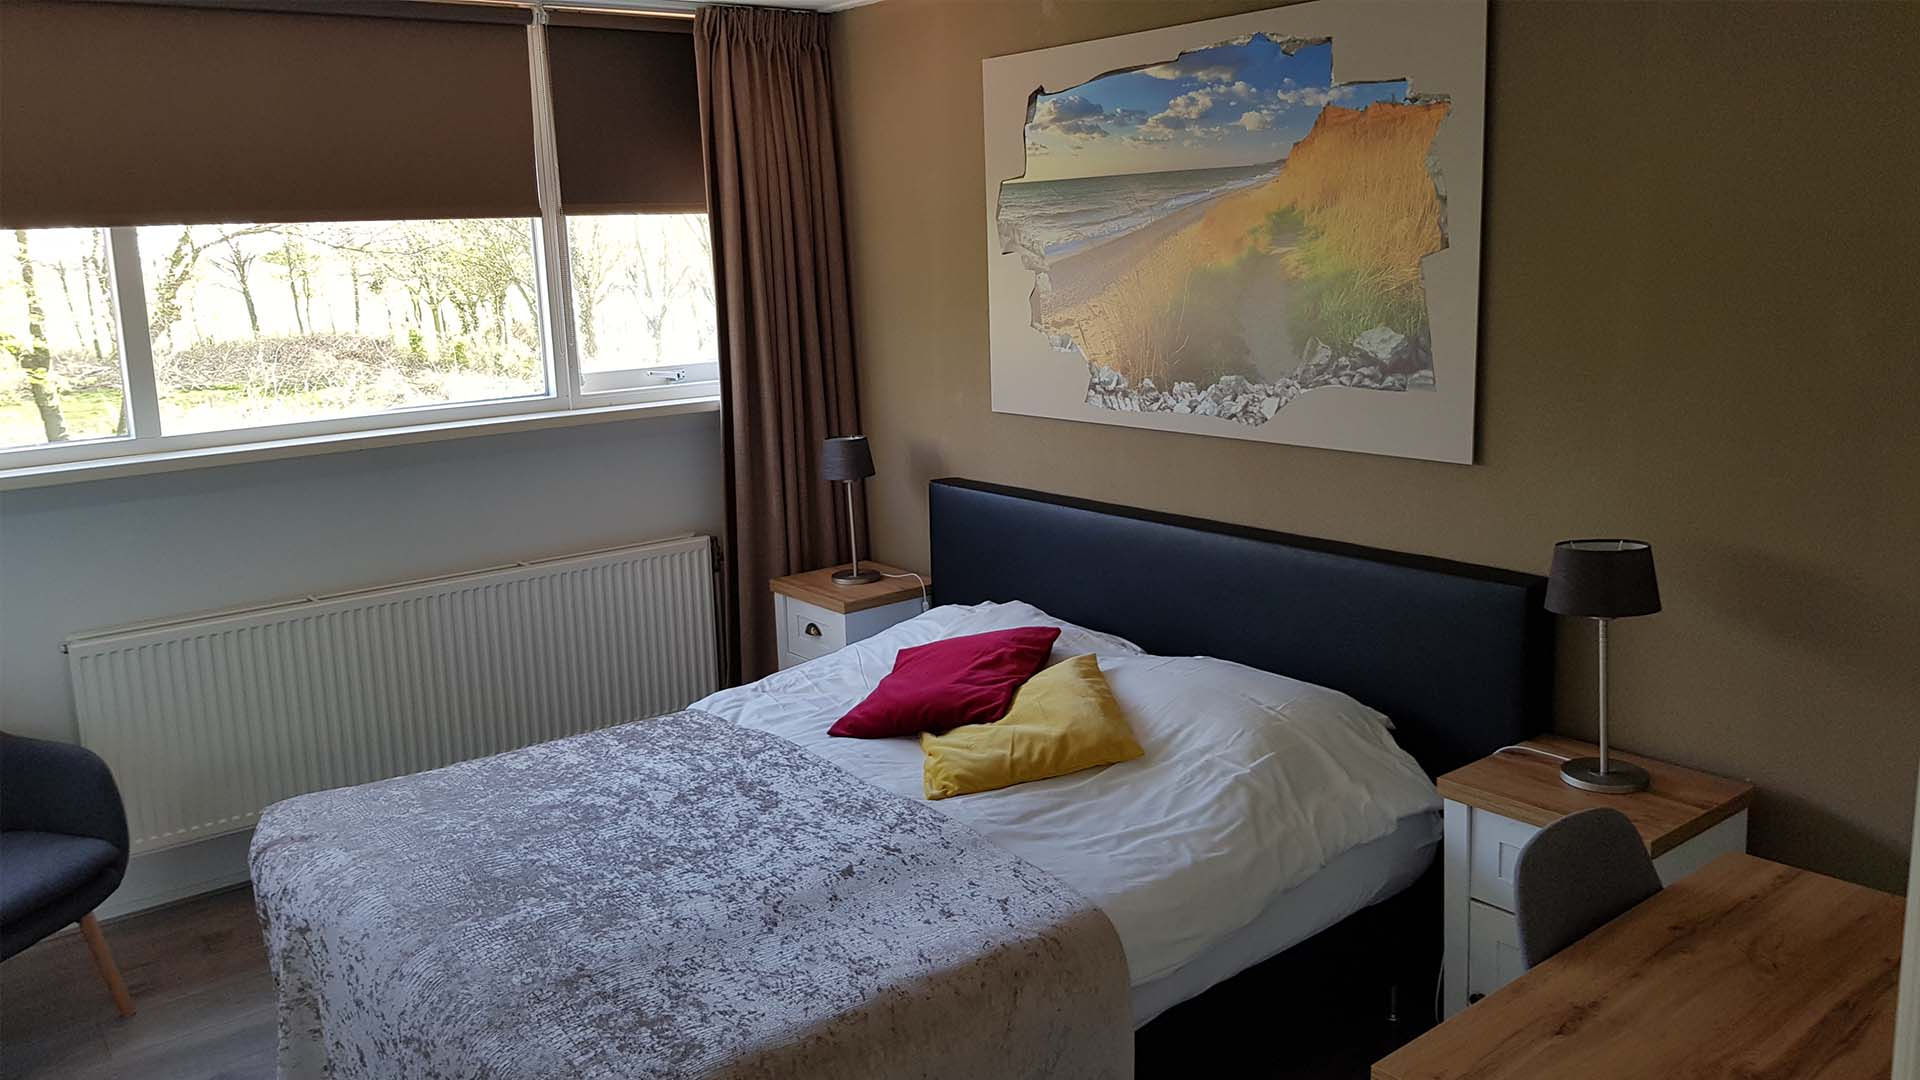 kamer 3 tweepersoonsbed B&B Plompetorenzicht Burg-Haamstede Zeeland